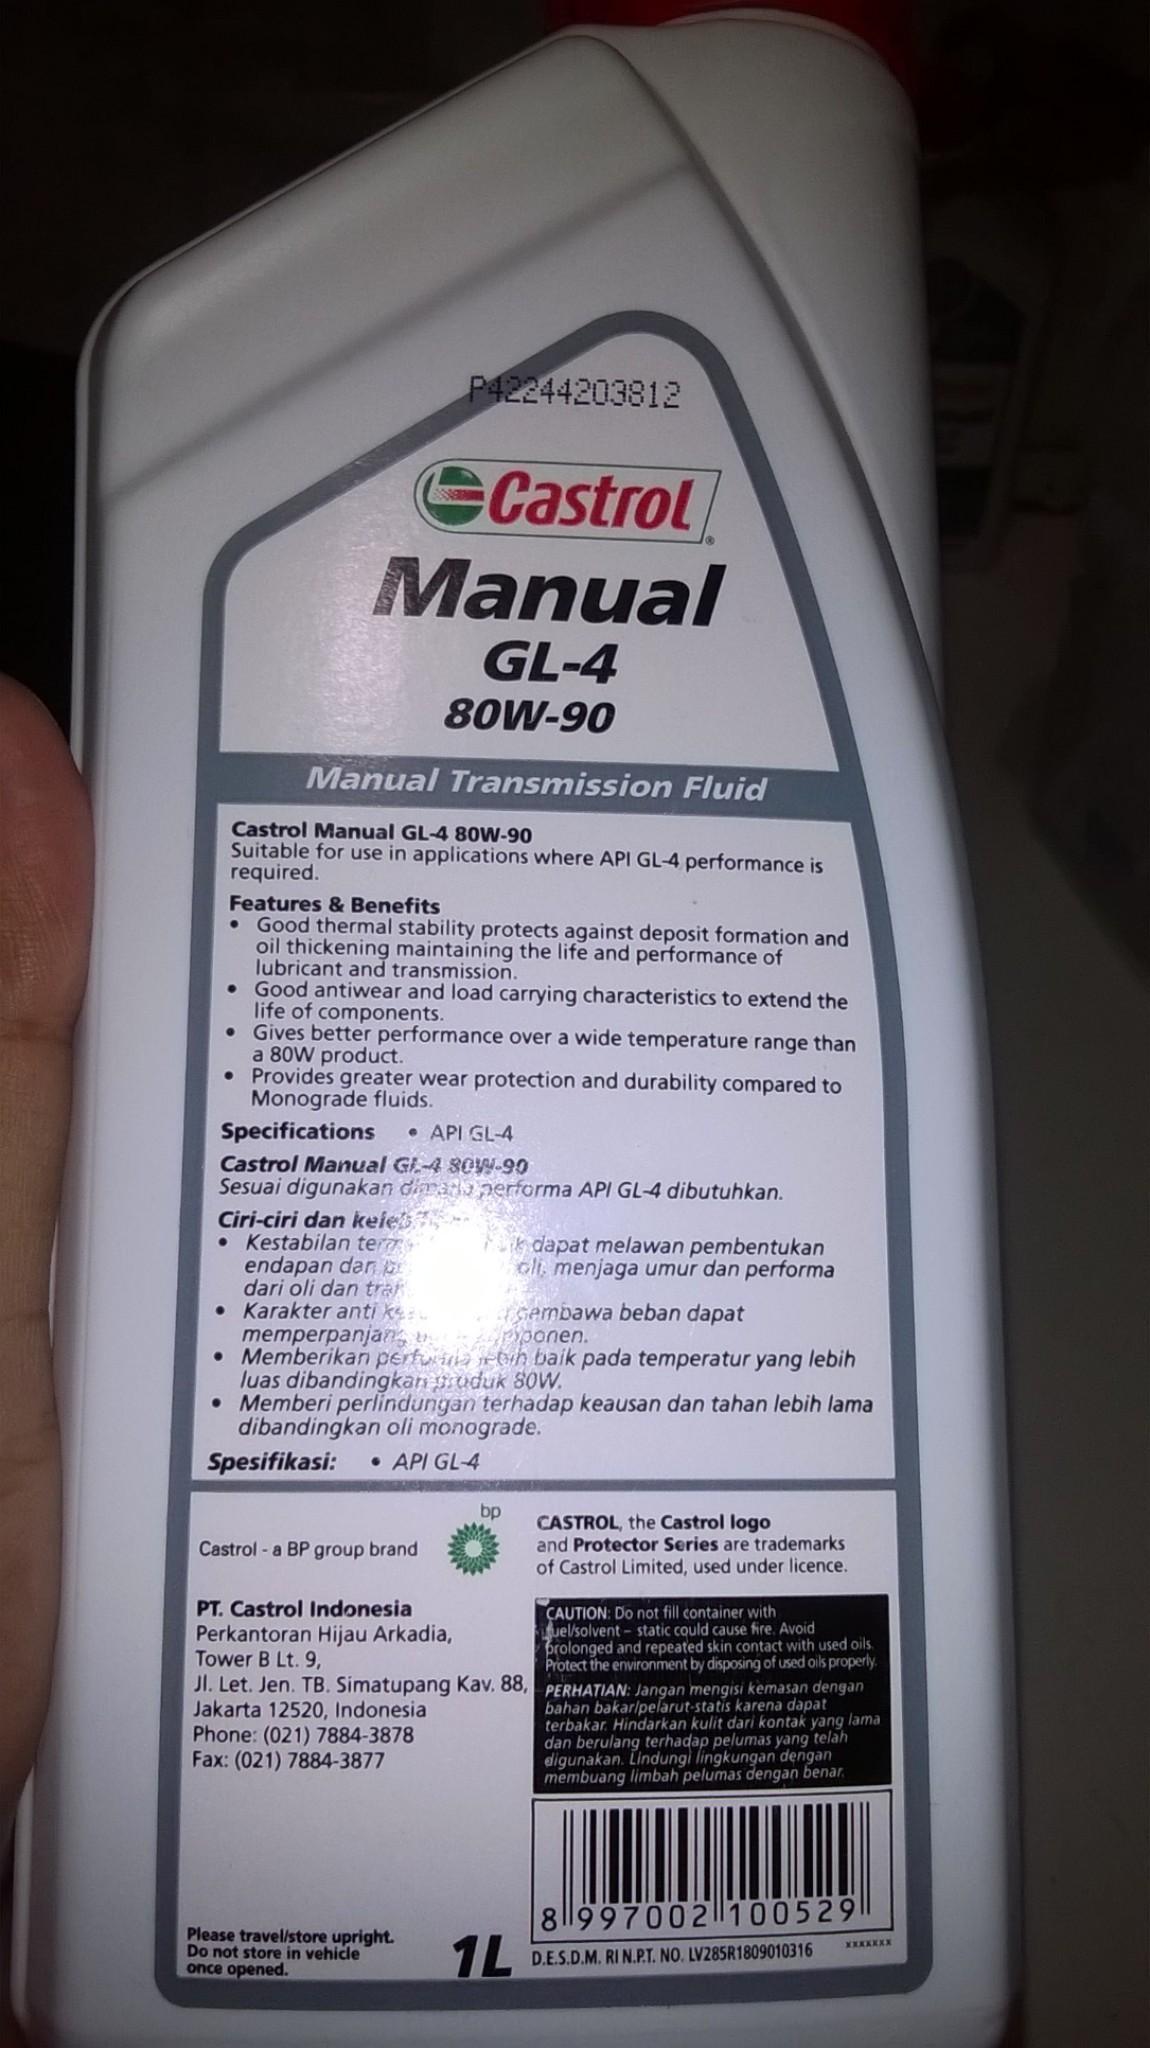 Castrol Universal 80W-90 | Castrol Australia | Castrol ...